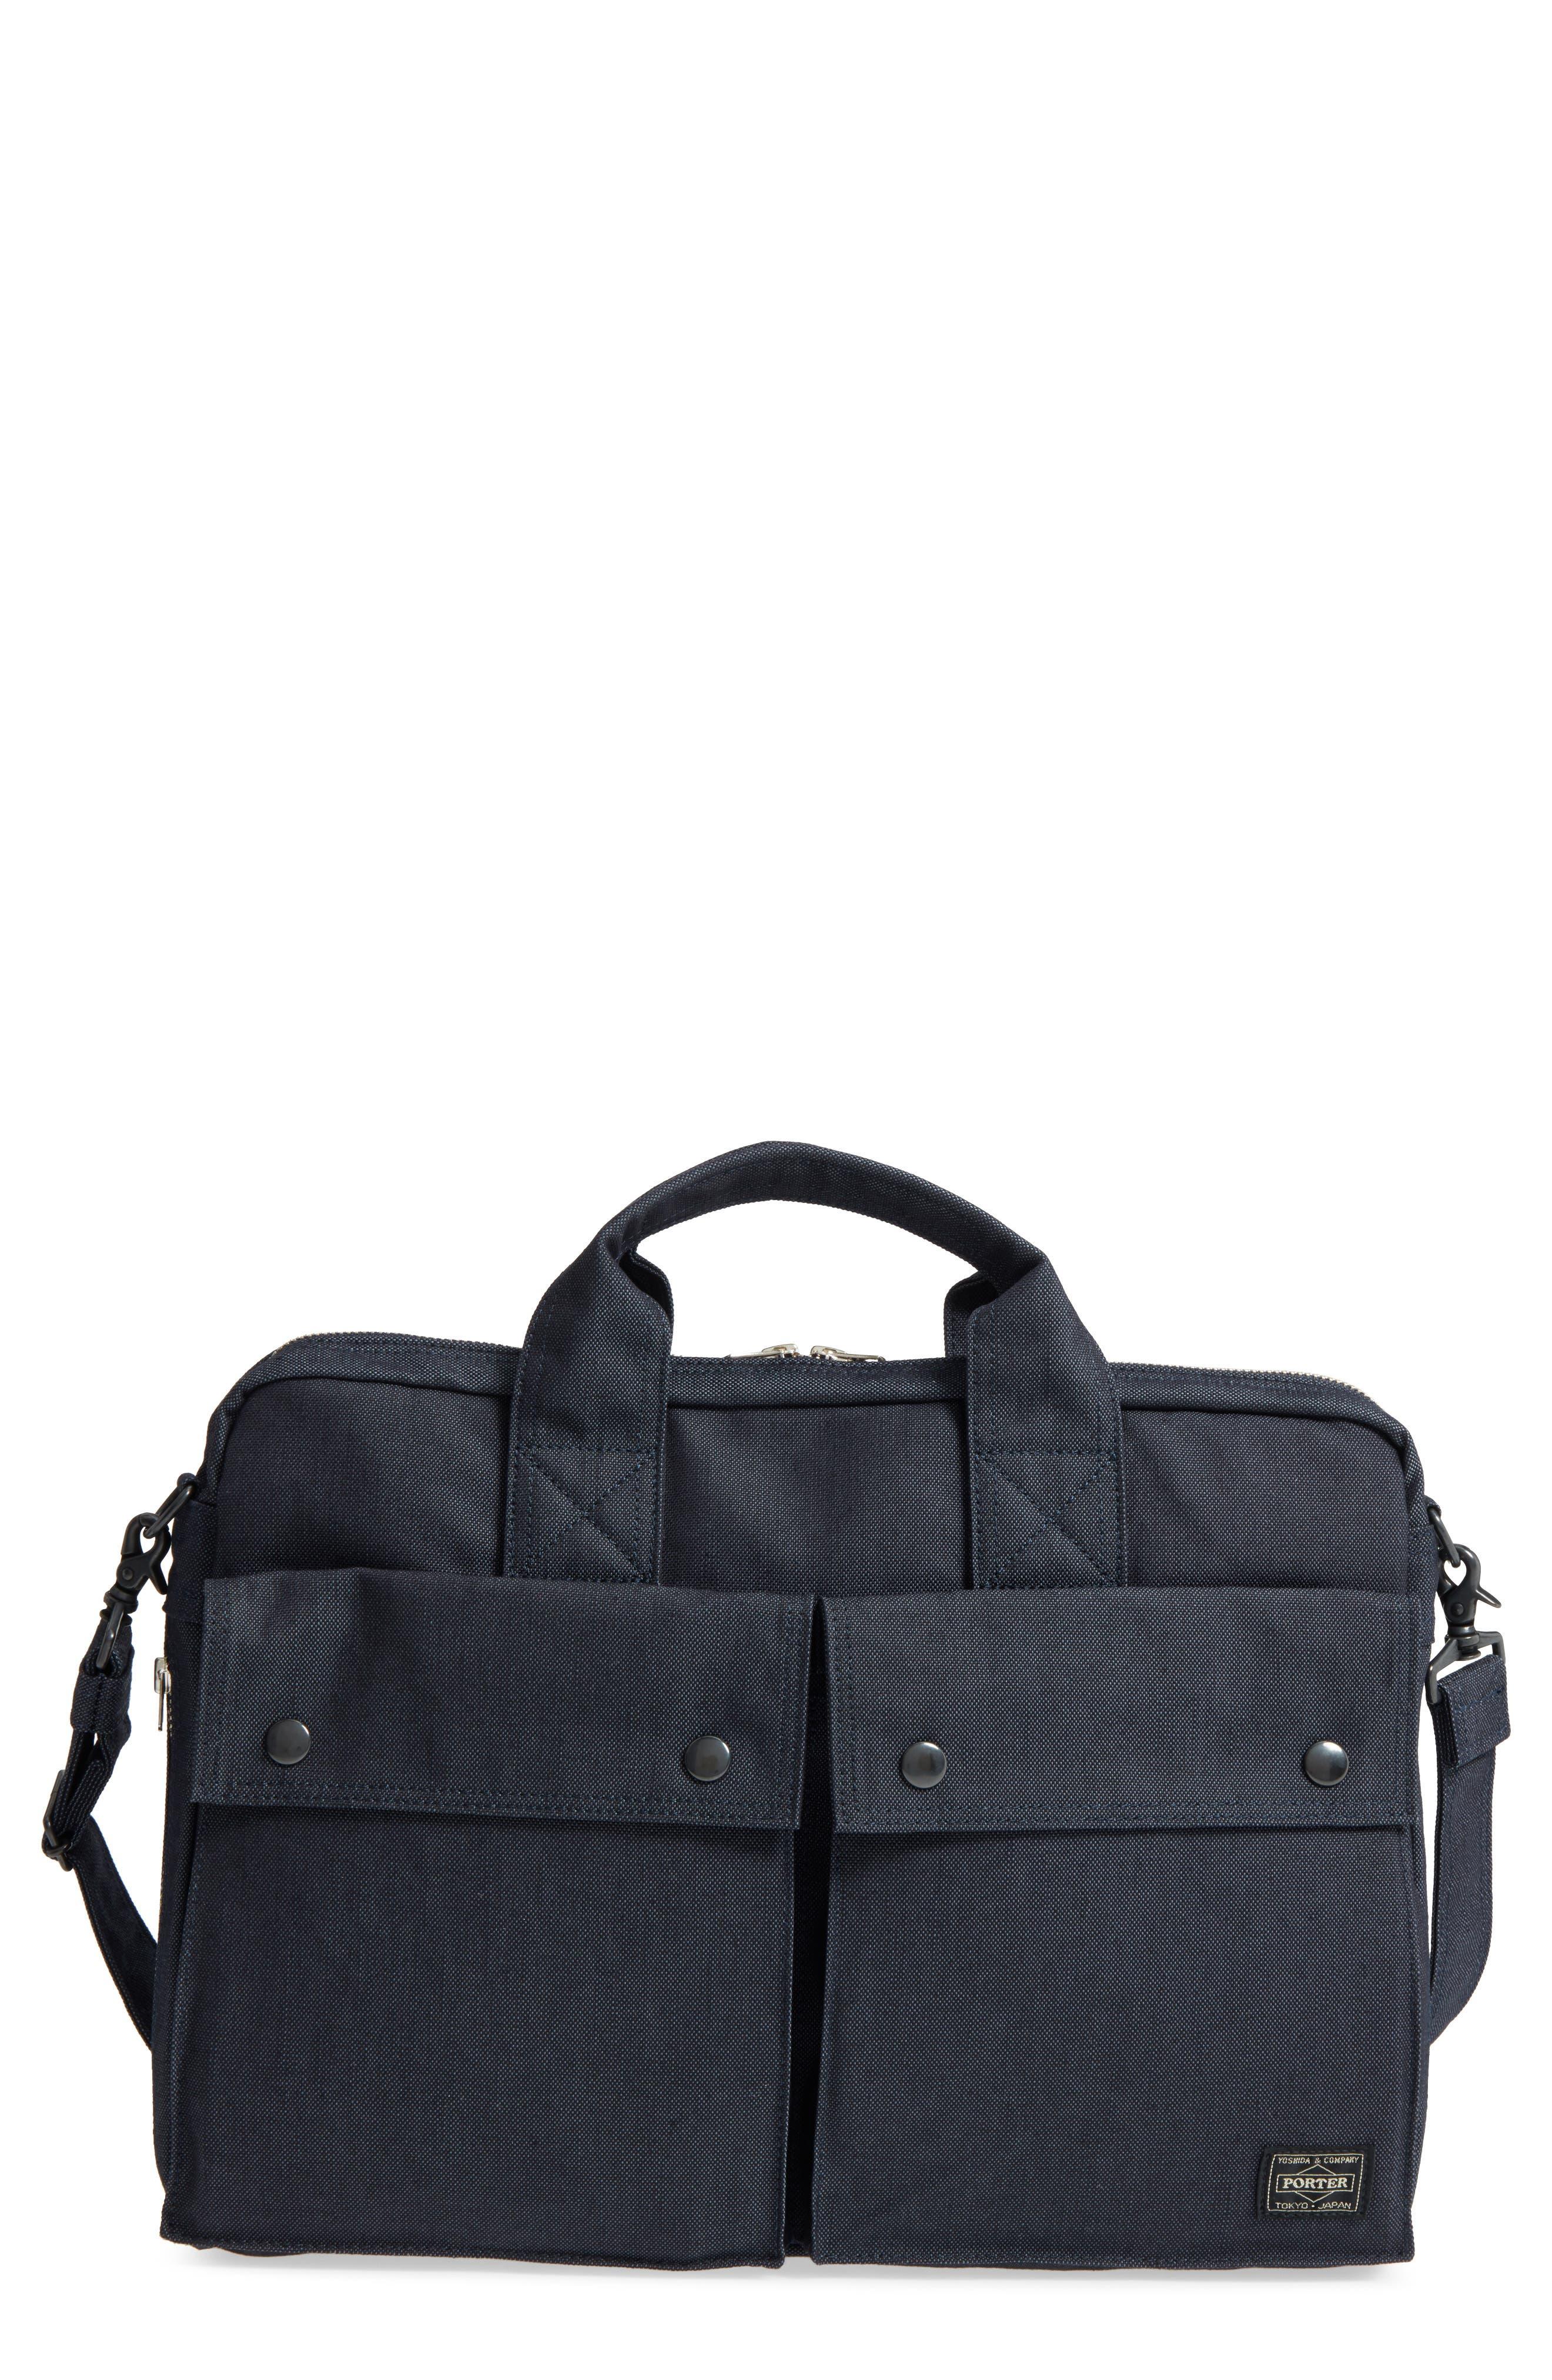 Porter-Yoshida & Co. Smoky Two-Way Briefcase,                         Main,                         color, 400